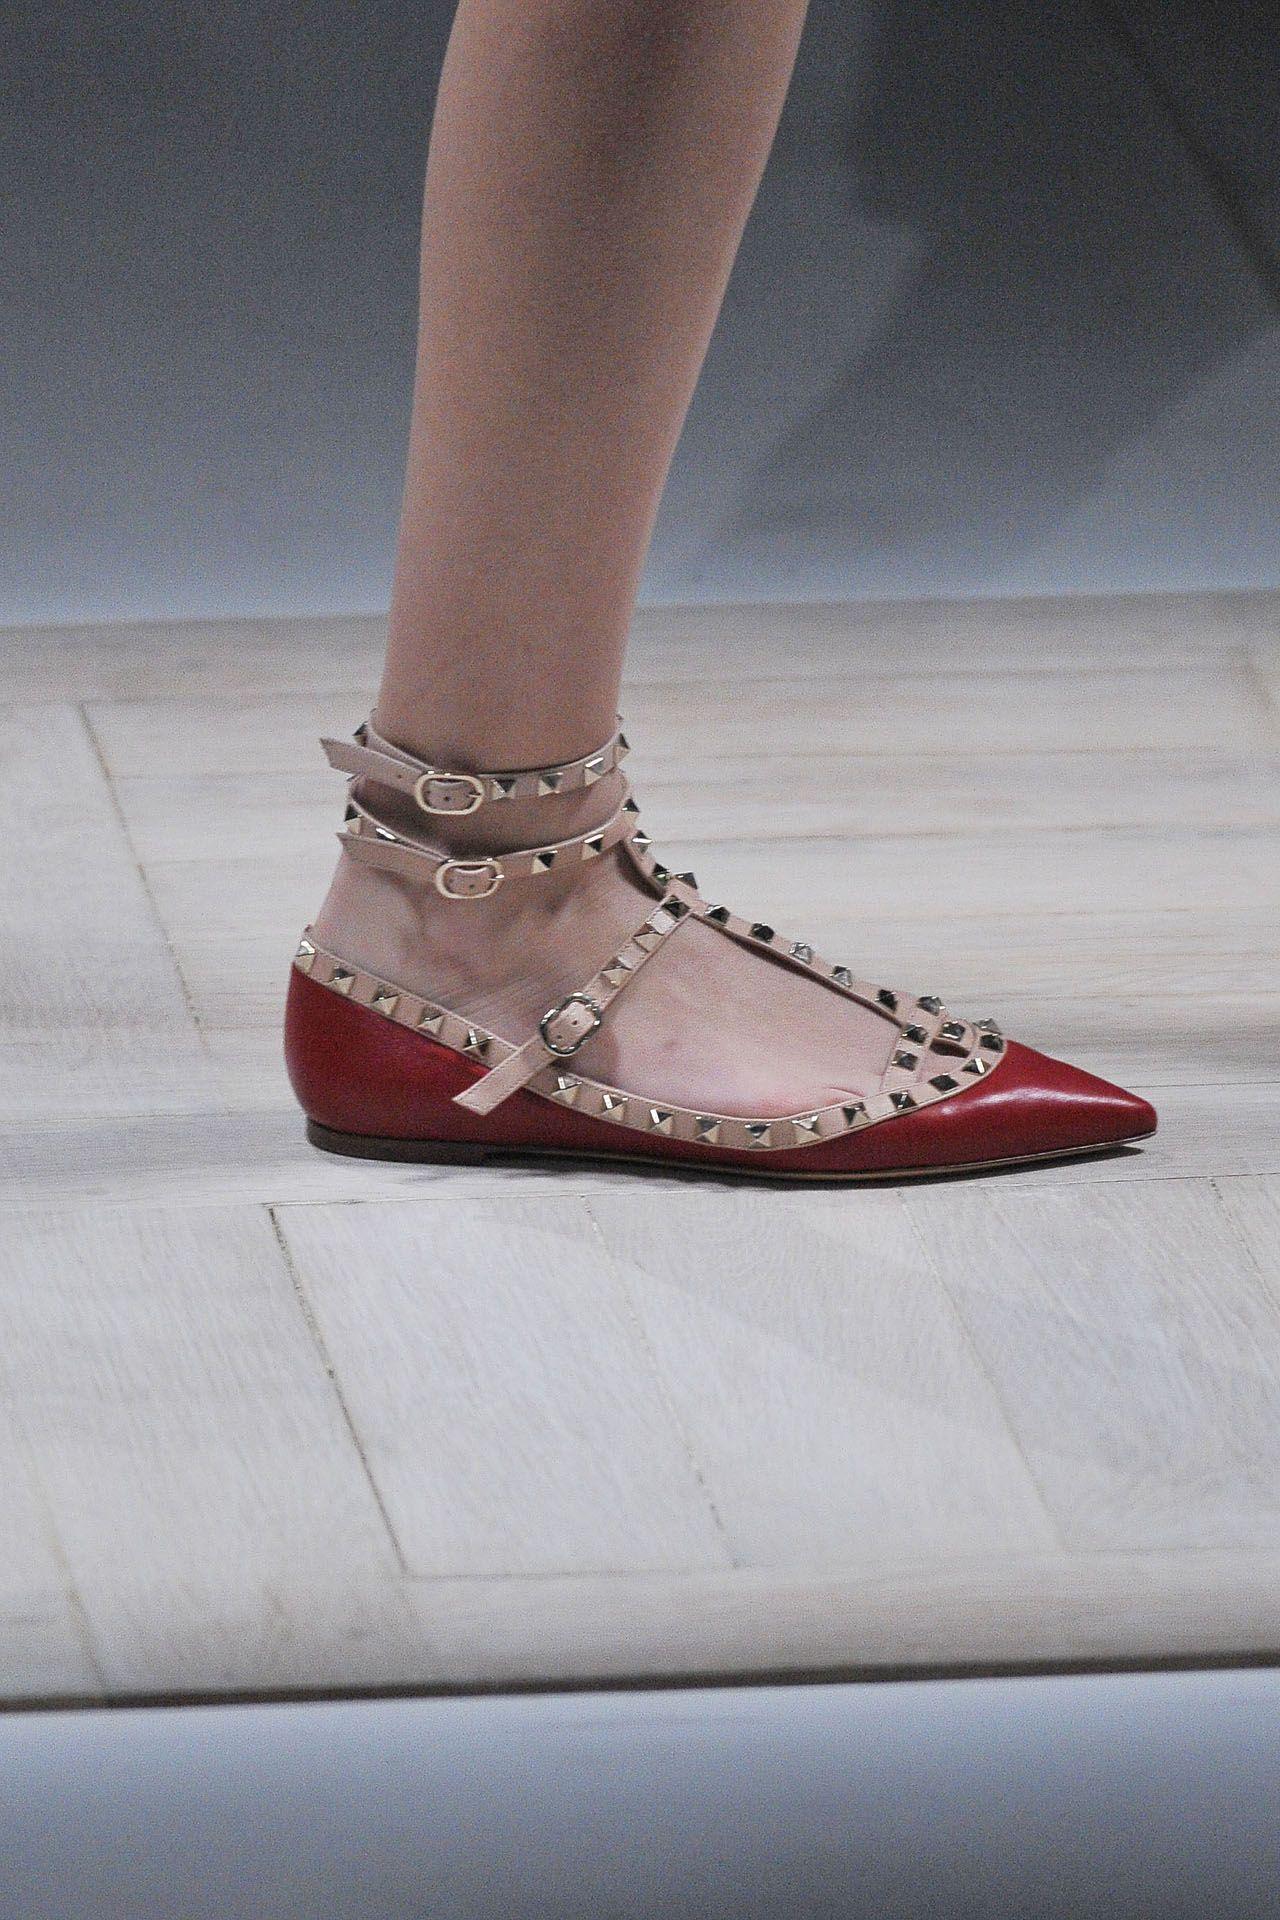 Valentino studded red flats - i'm